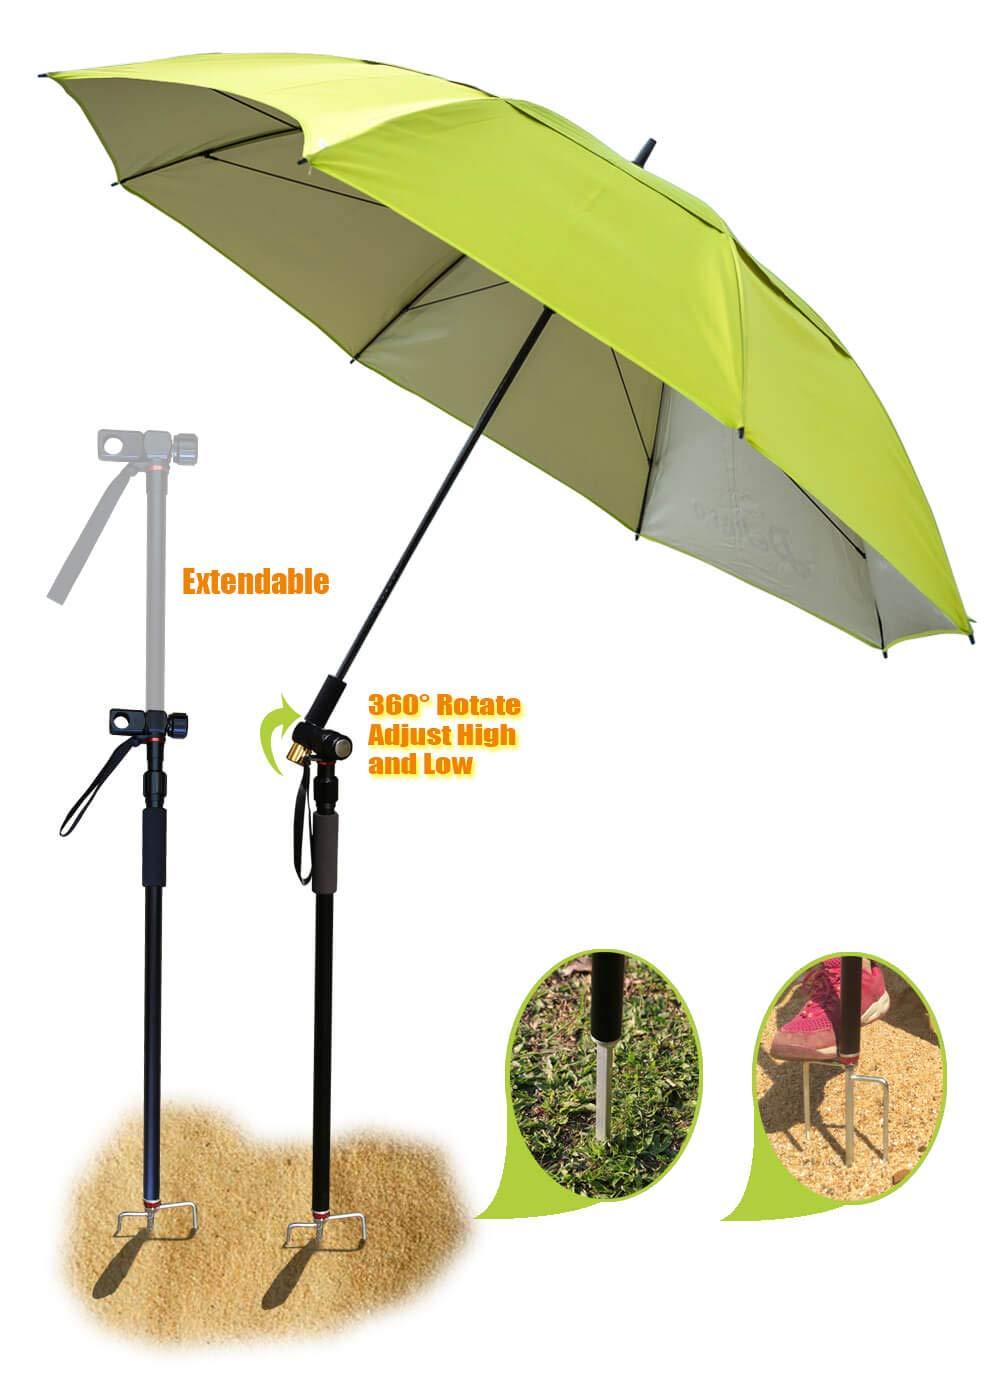 Fishing patio beach umbrella with 4.39lb, windproof/waterprool/portable Tilt and Telescoping Pole/Sand Anchor sturdy umbrella, use for beach/lawn/back yard/patio/park/shadezilla/outdoor travel/garden by Dekero